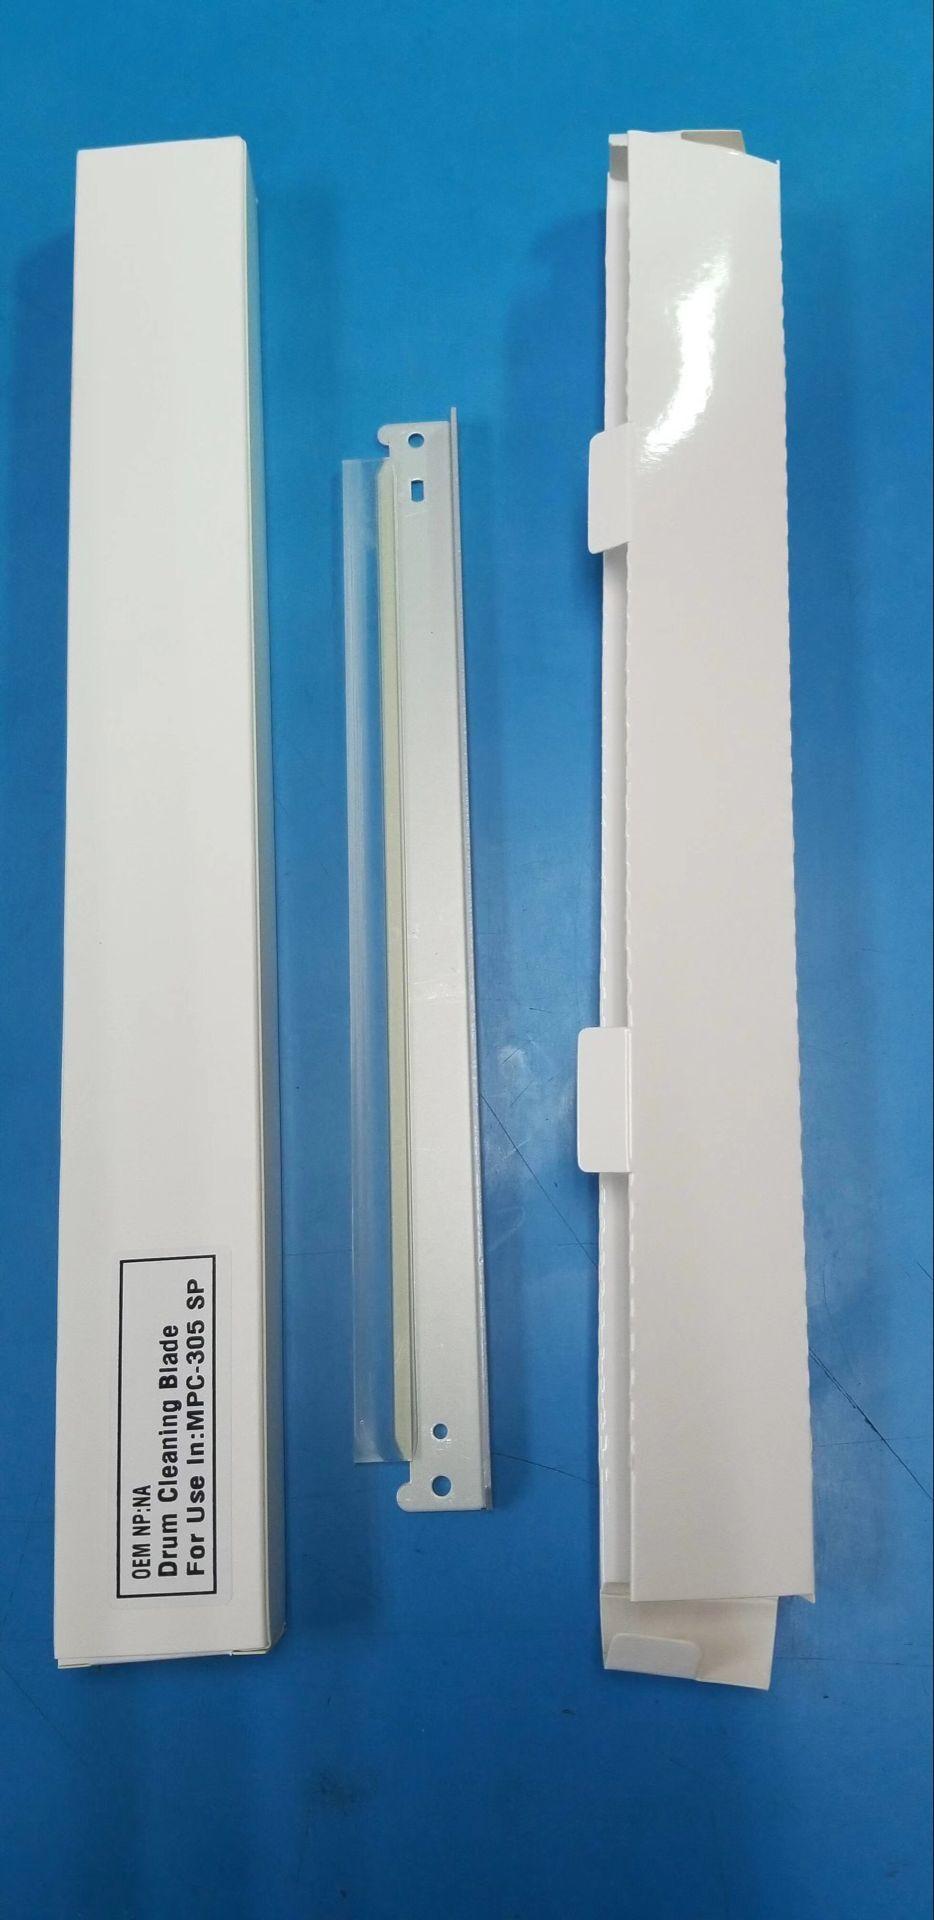 Frete grátis 4 pces copiadora tambor lâmina